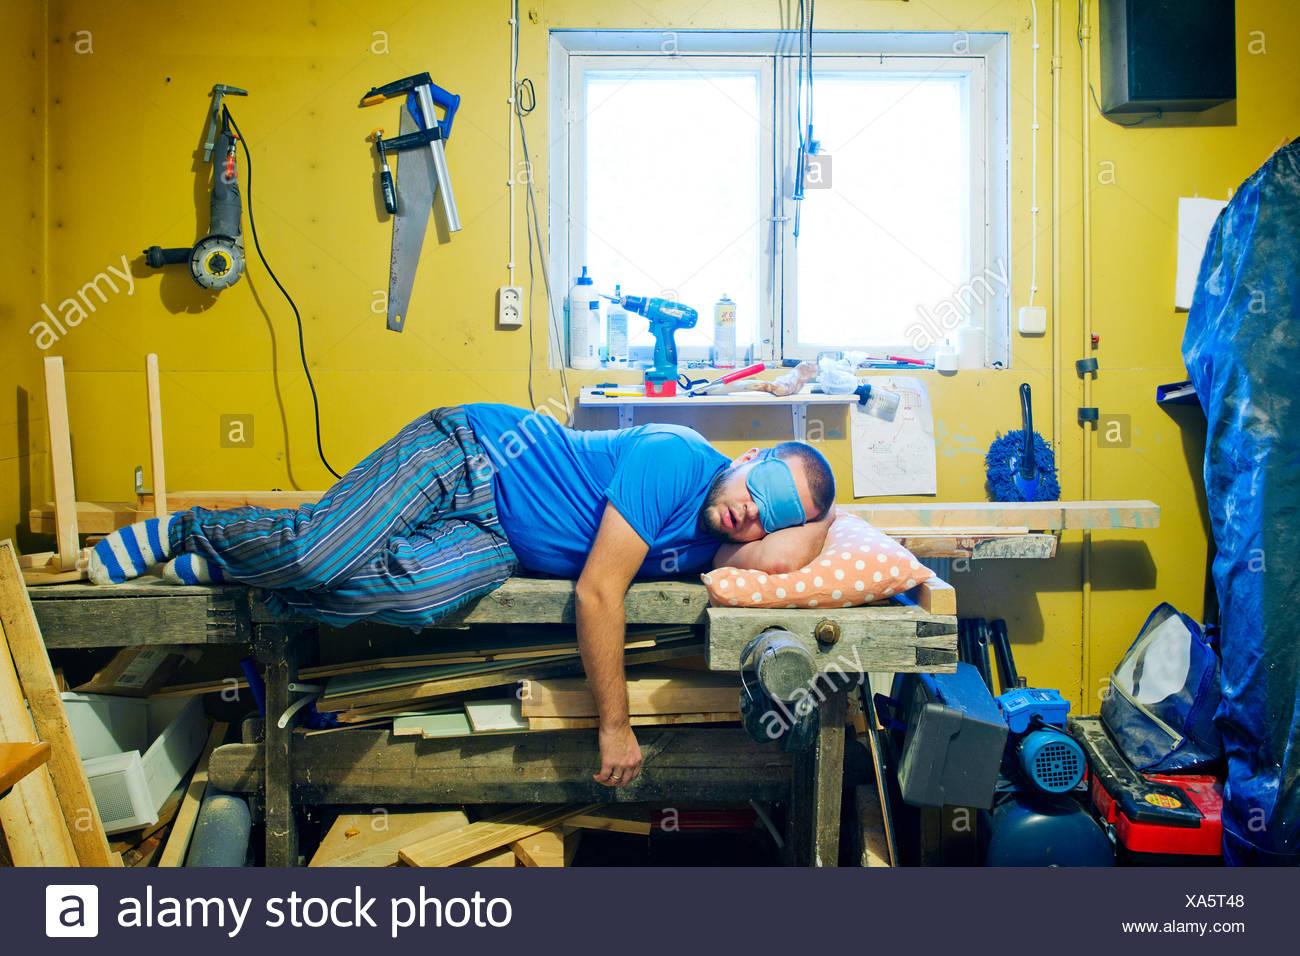 Man sleeping on workshop's table - Stock Image